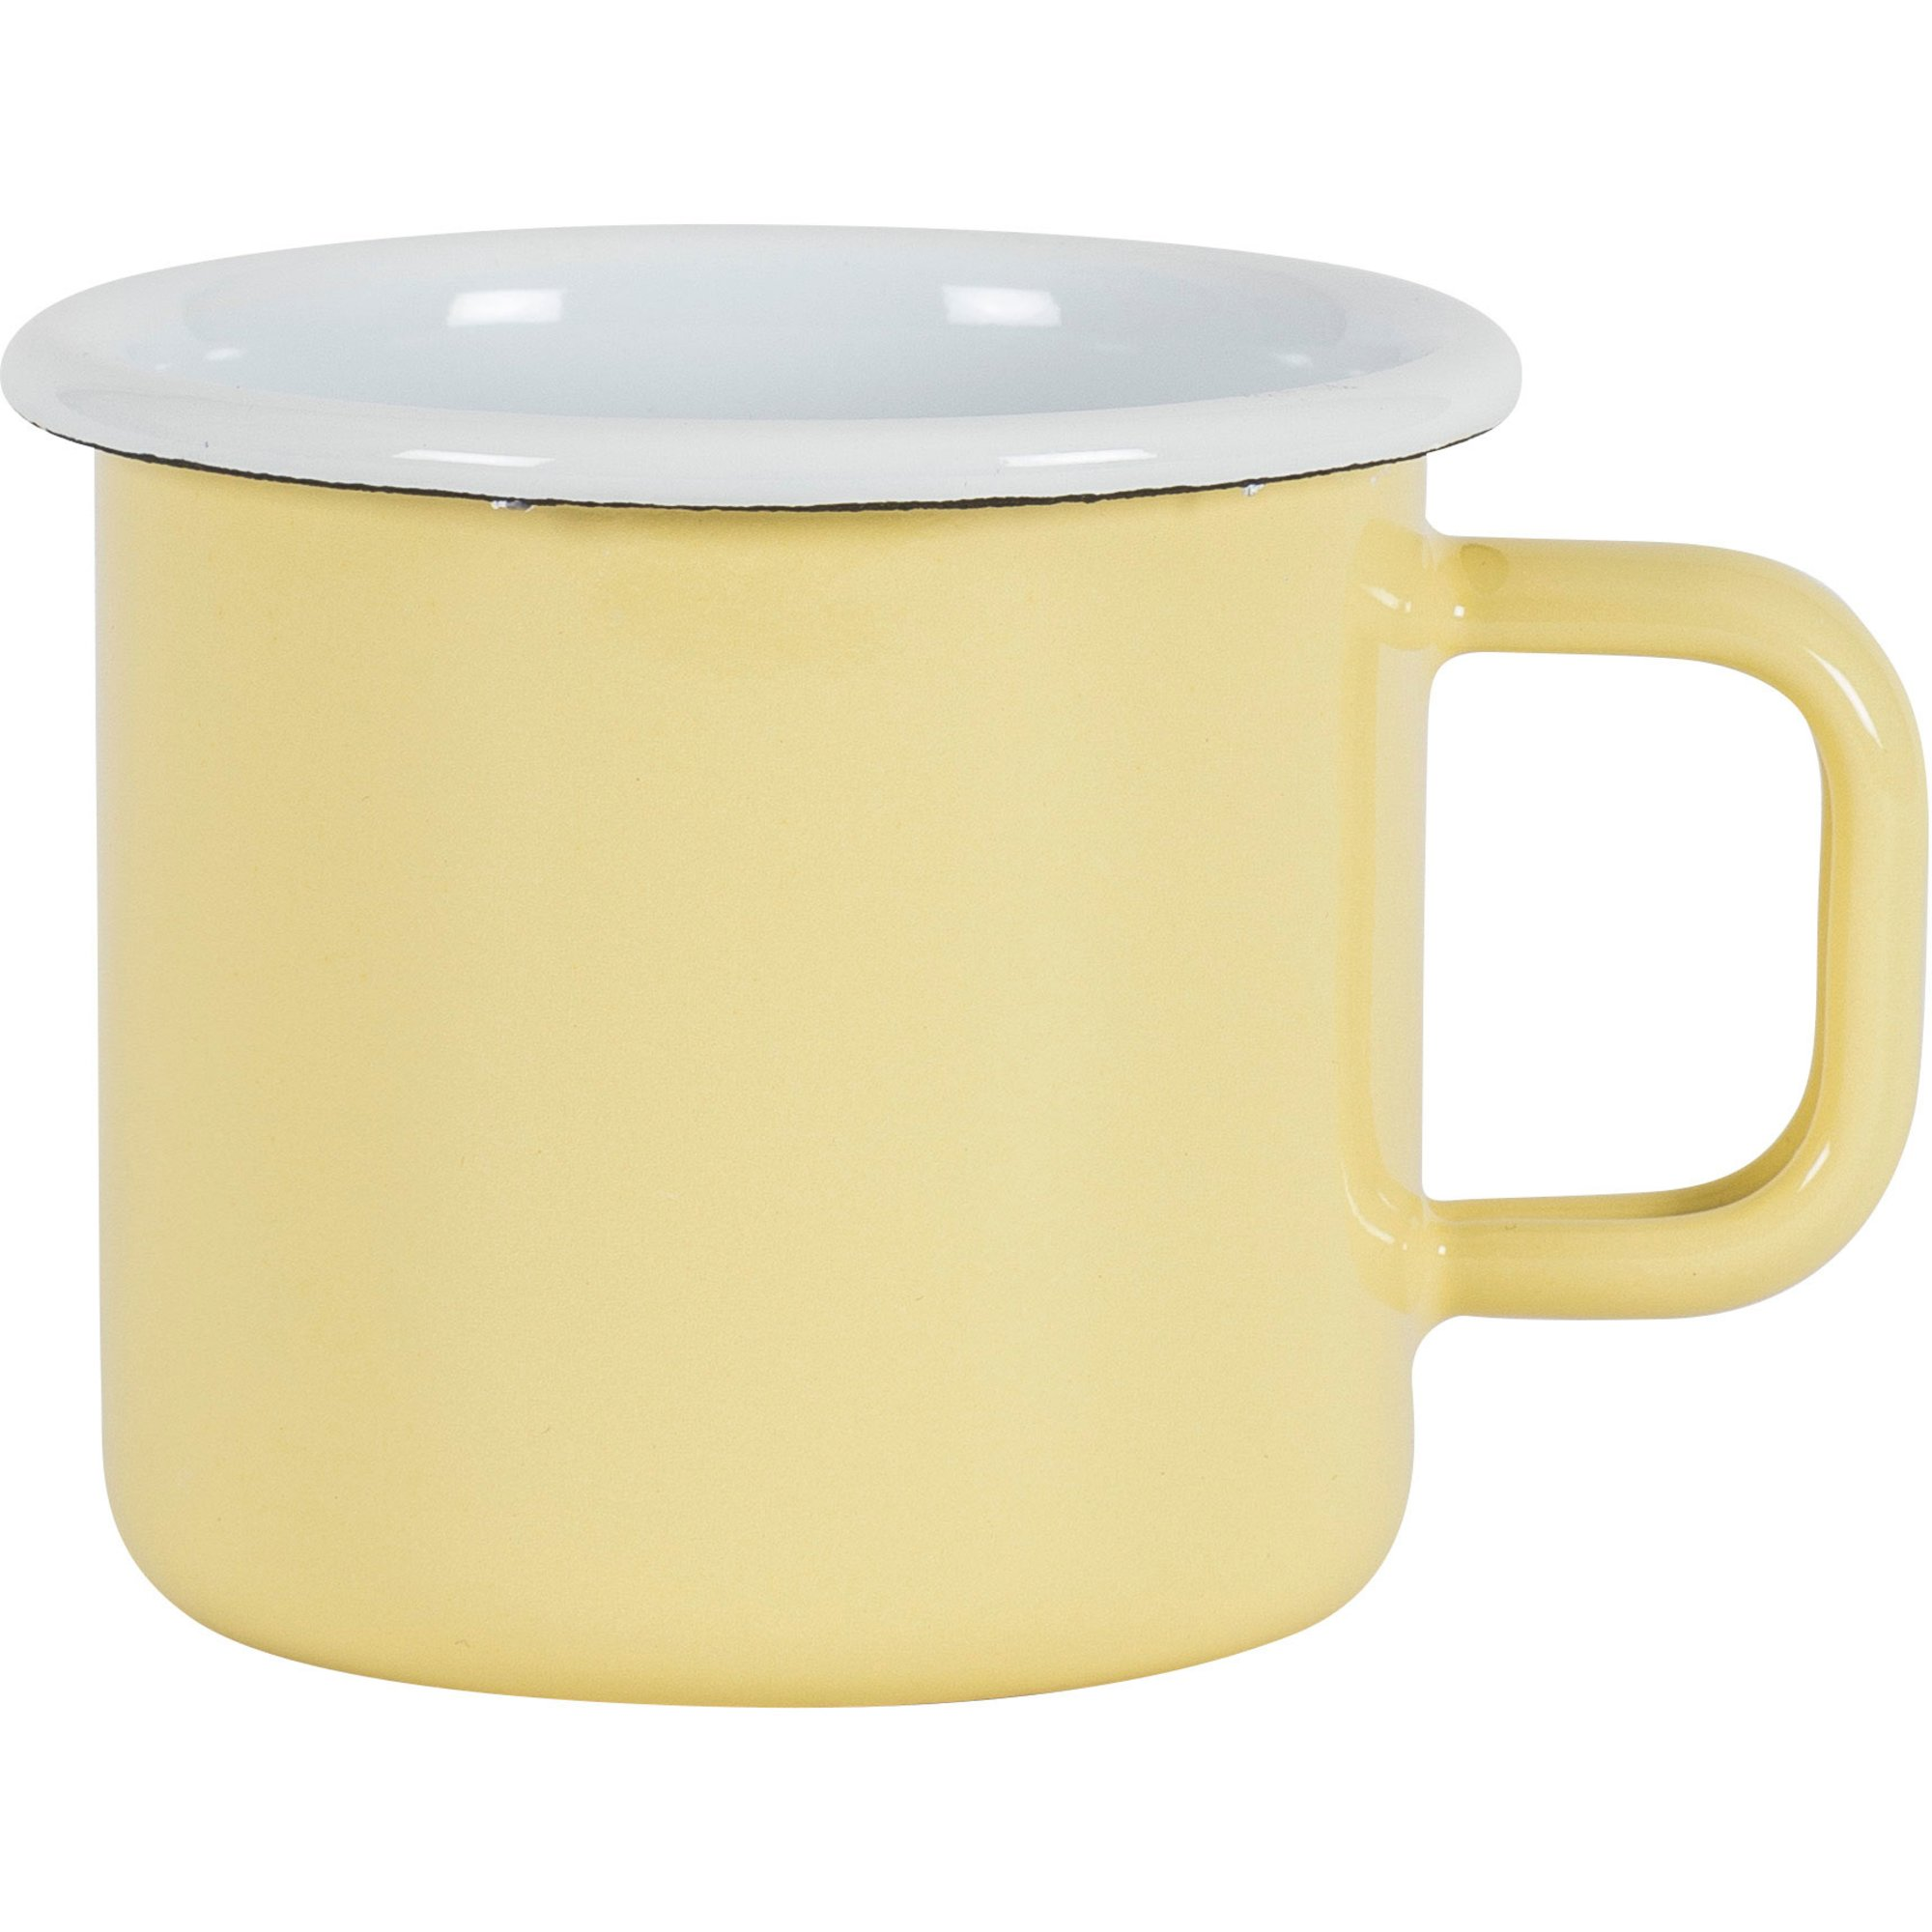 Kockums Jernverk Mugg, gul